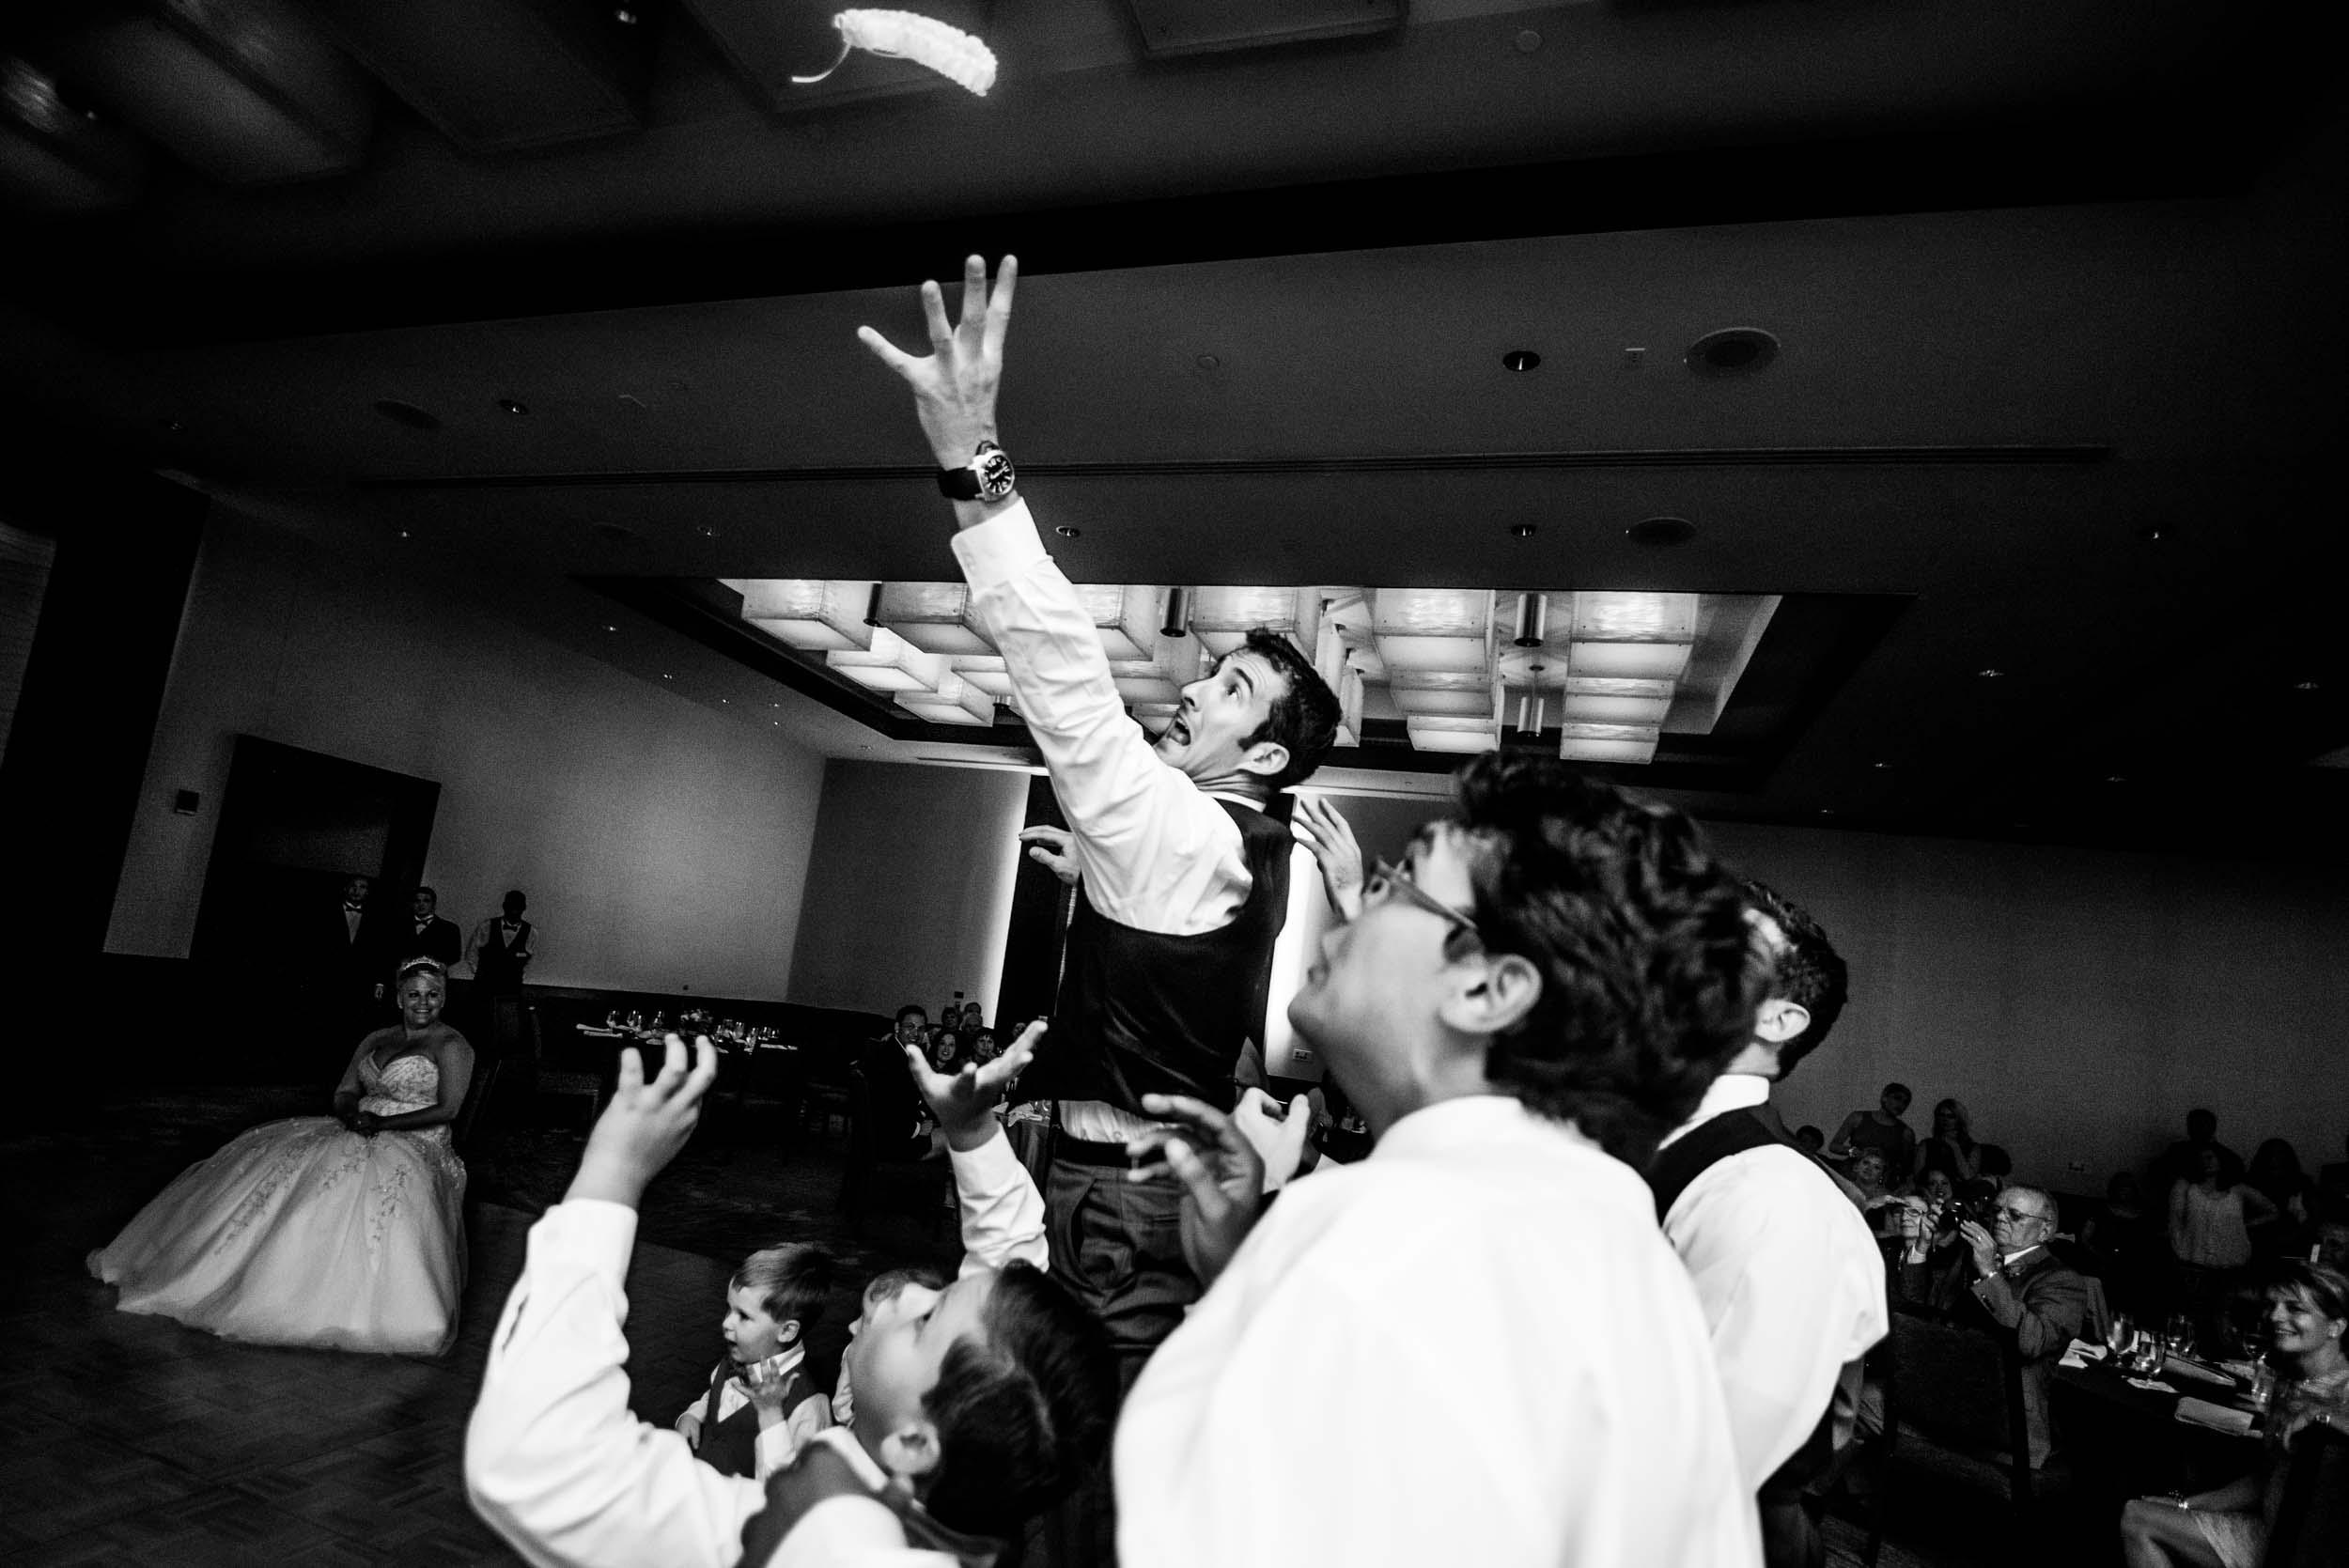 dc+metro+wedding+photographer+vadym+guliuk+photography+wedding+reception-2022.jpg